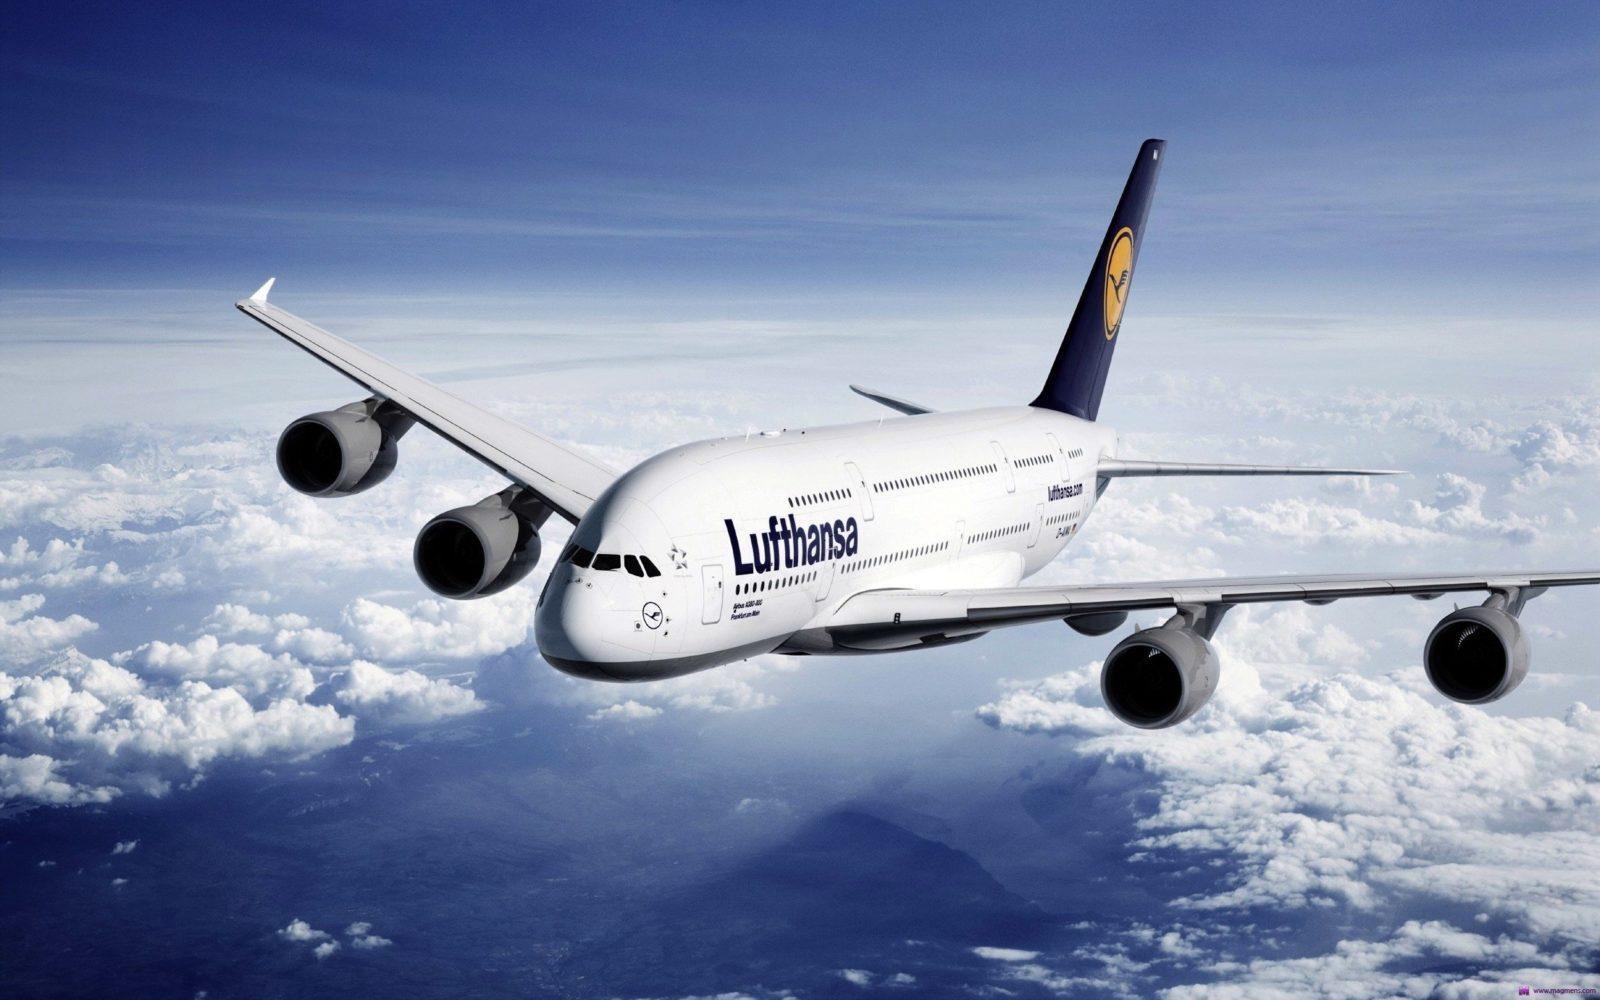 Lufthansa - ავიაკომპანია ლუფთანსა - Lufthansa